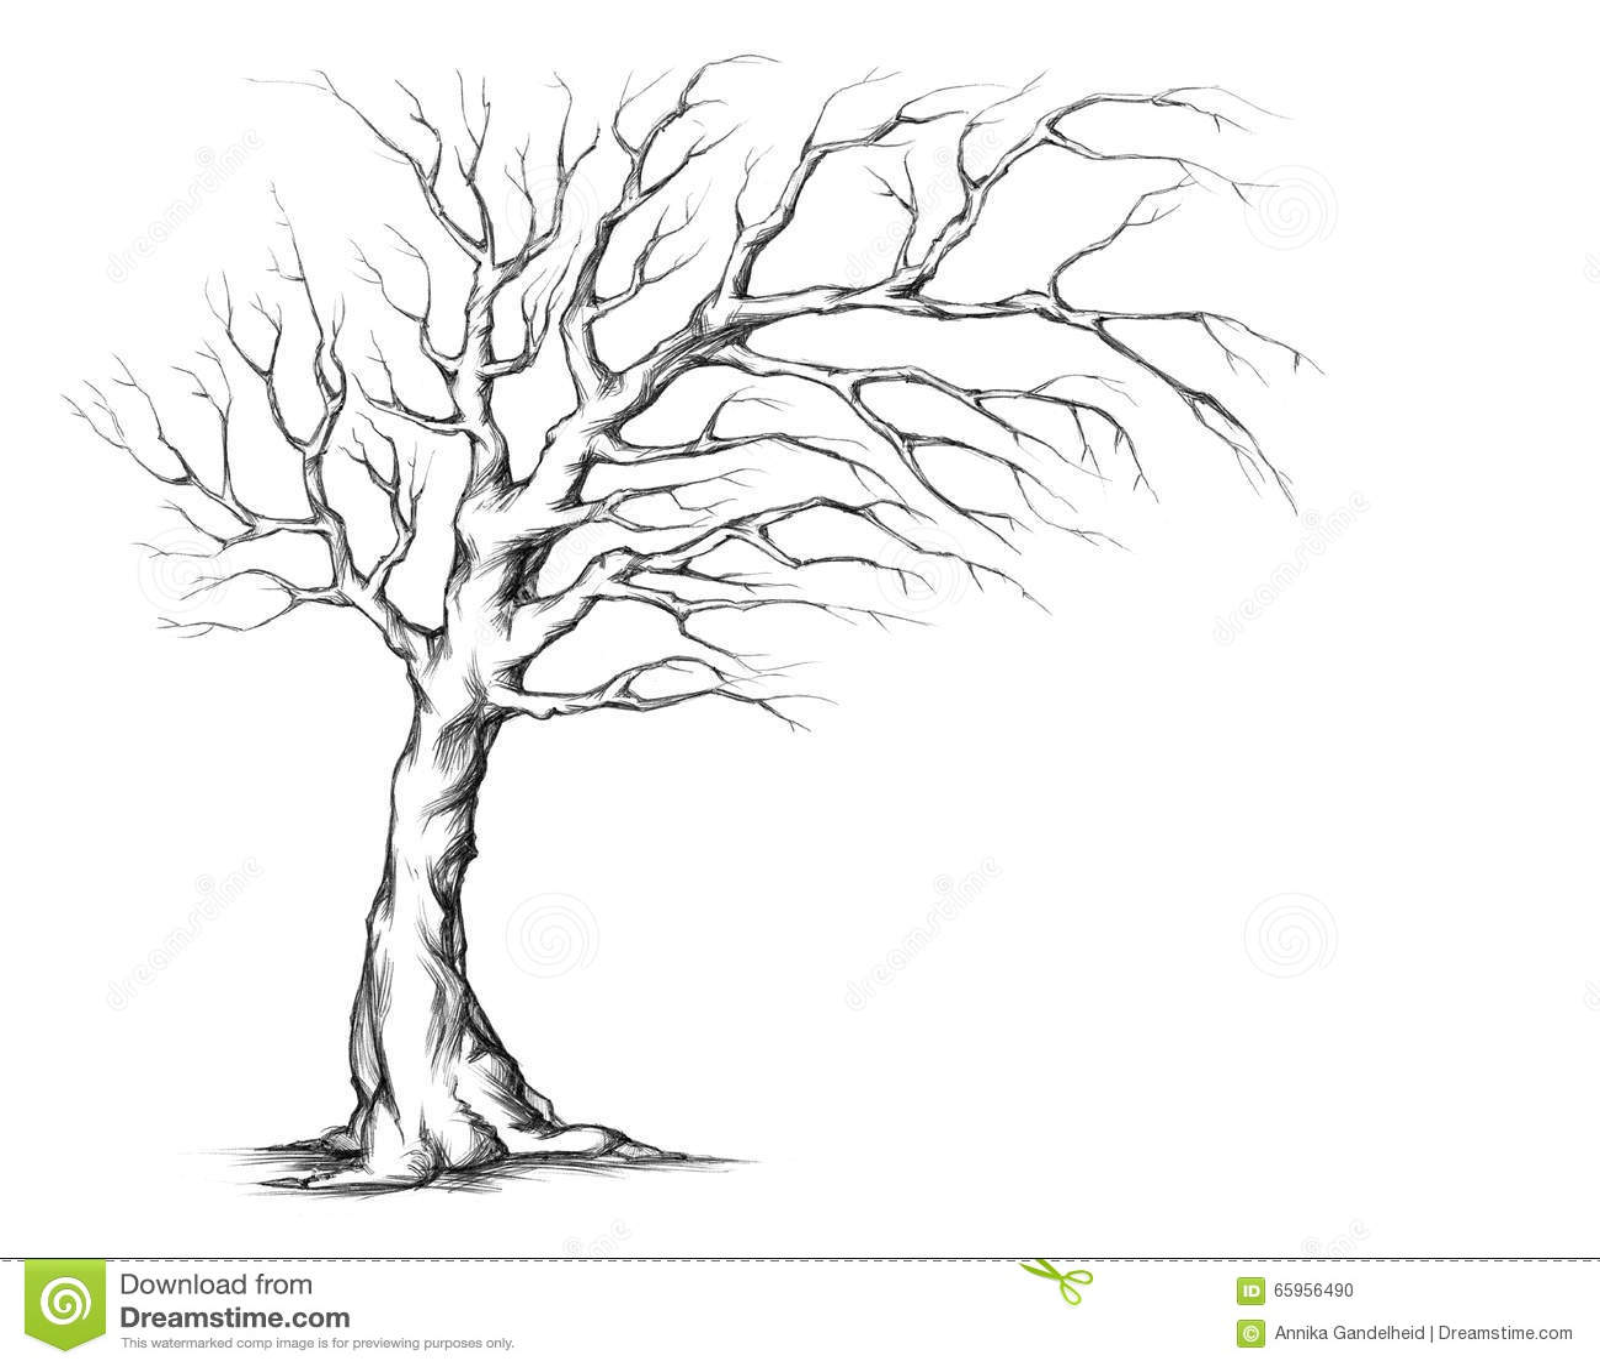 stock illustration wedding tree asymmetric crown illustration asymetric image wedding tree Wedding tree with asymmetric crown